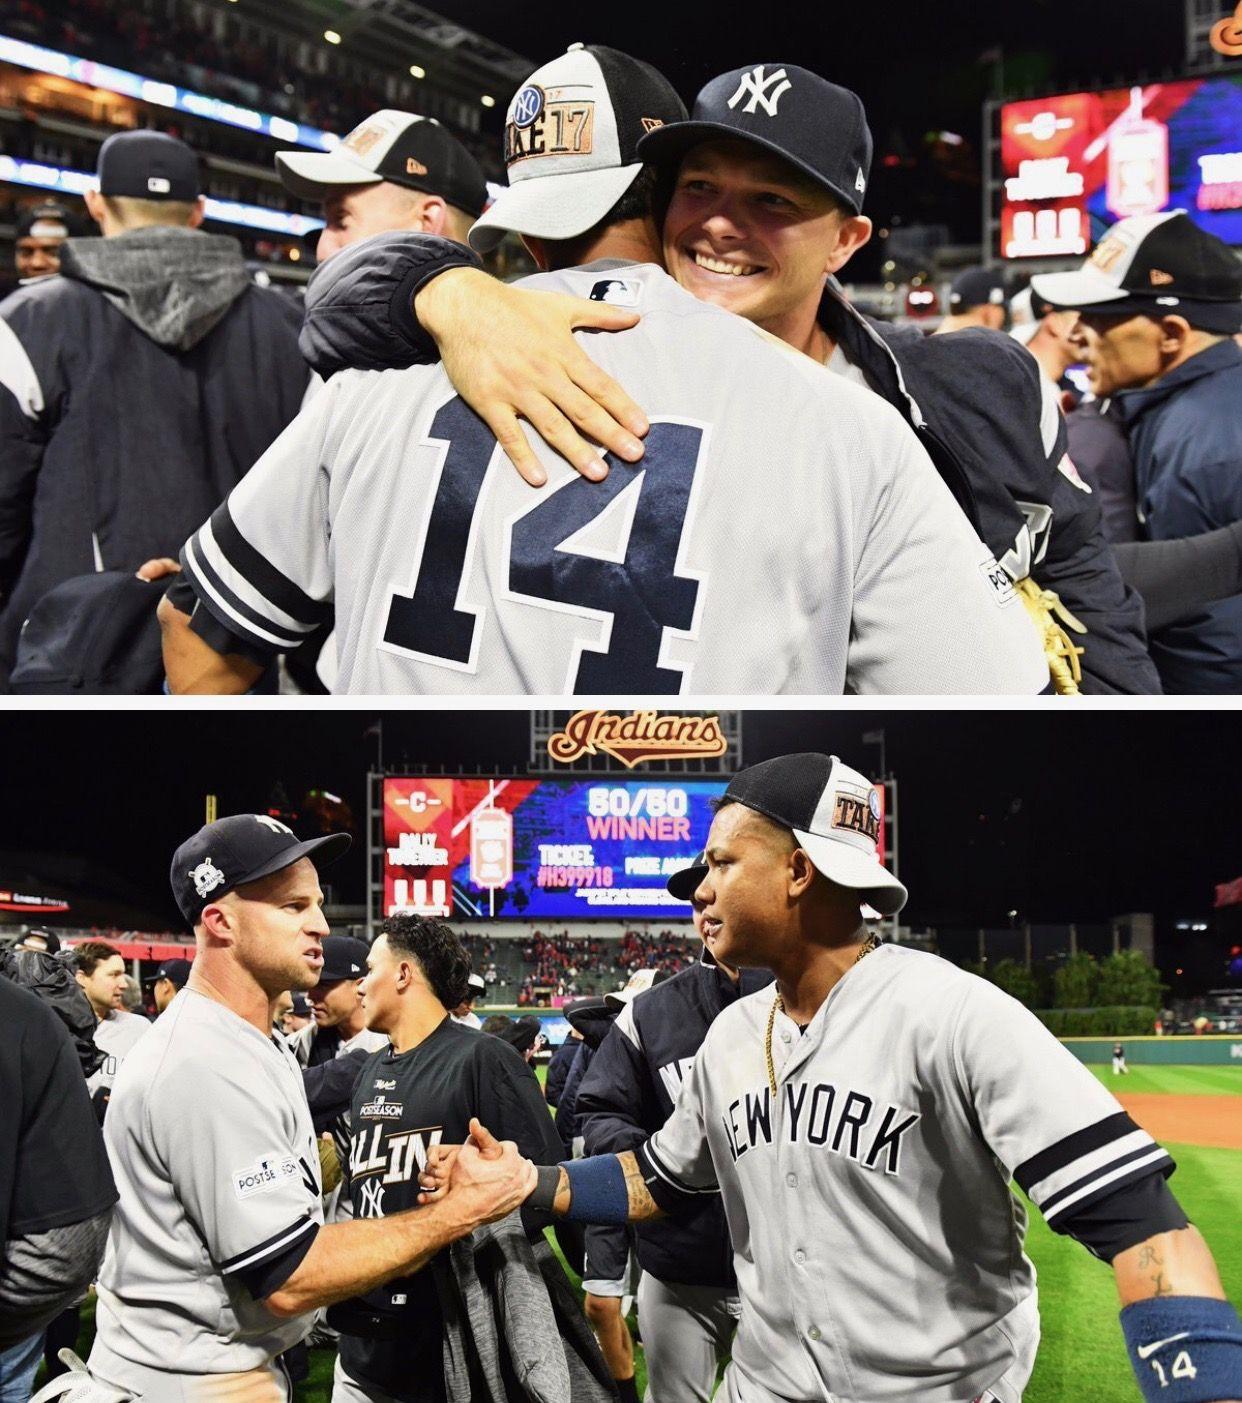 Winners New York Yankees Ny Yankees Yankees